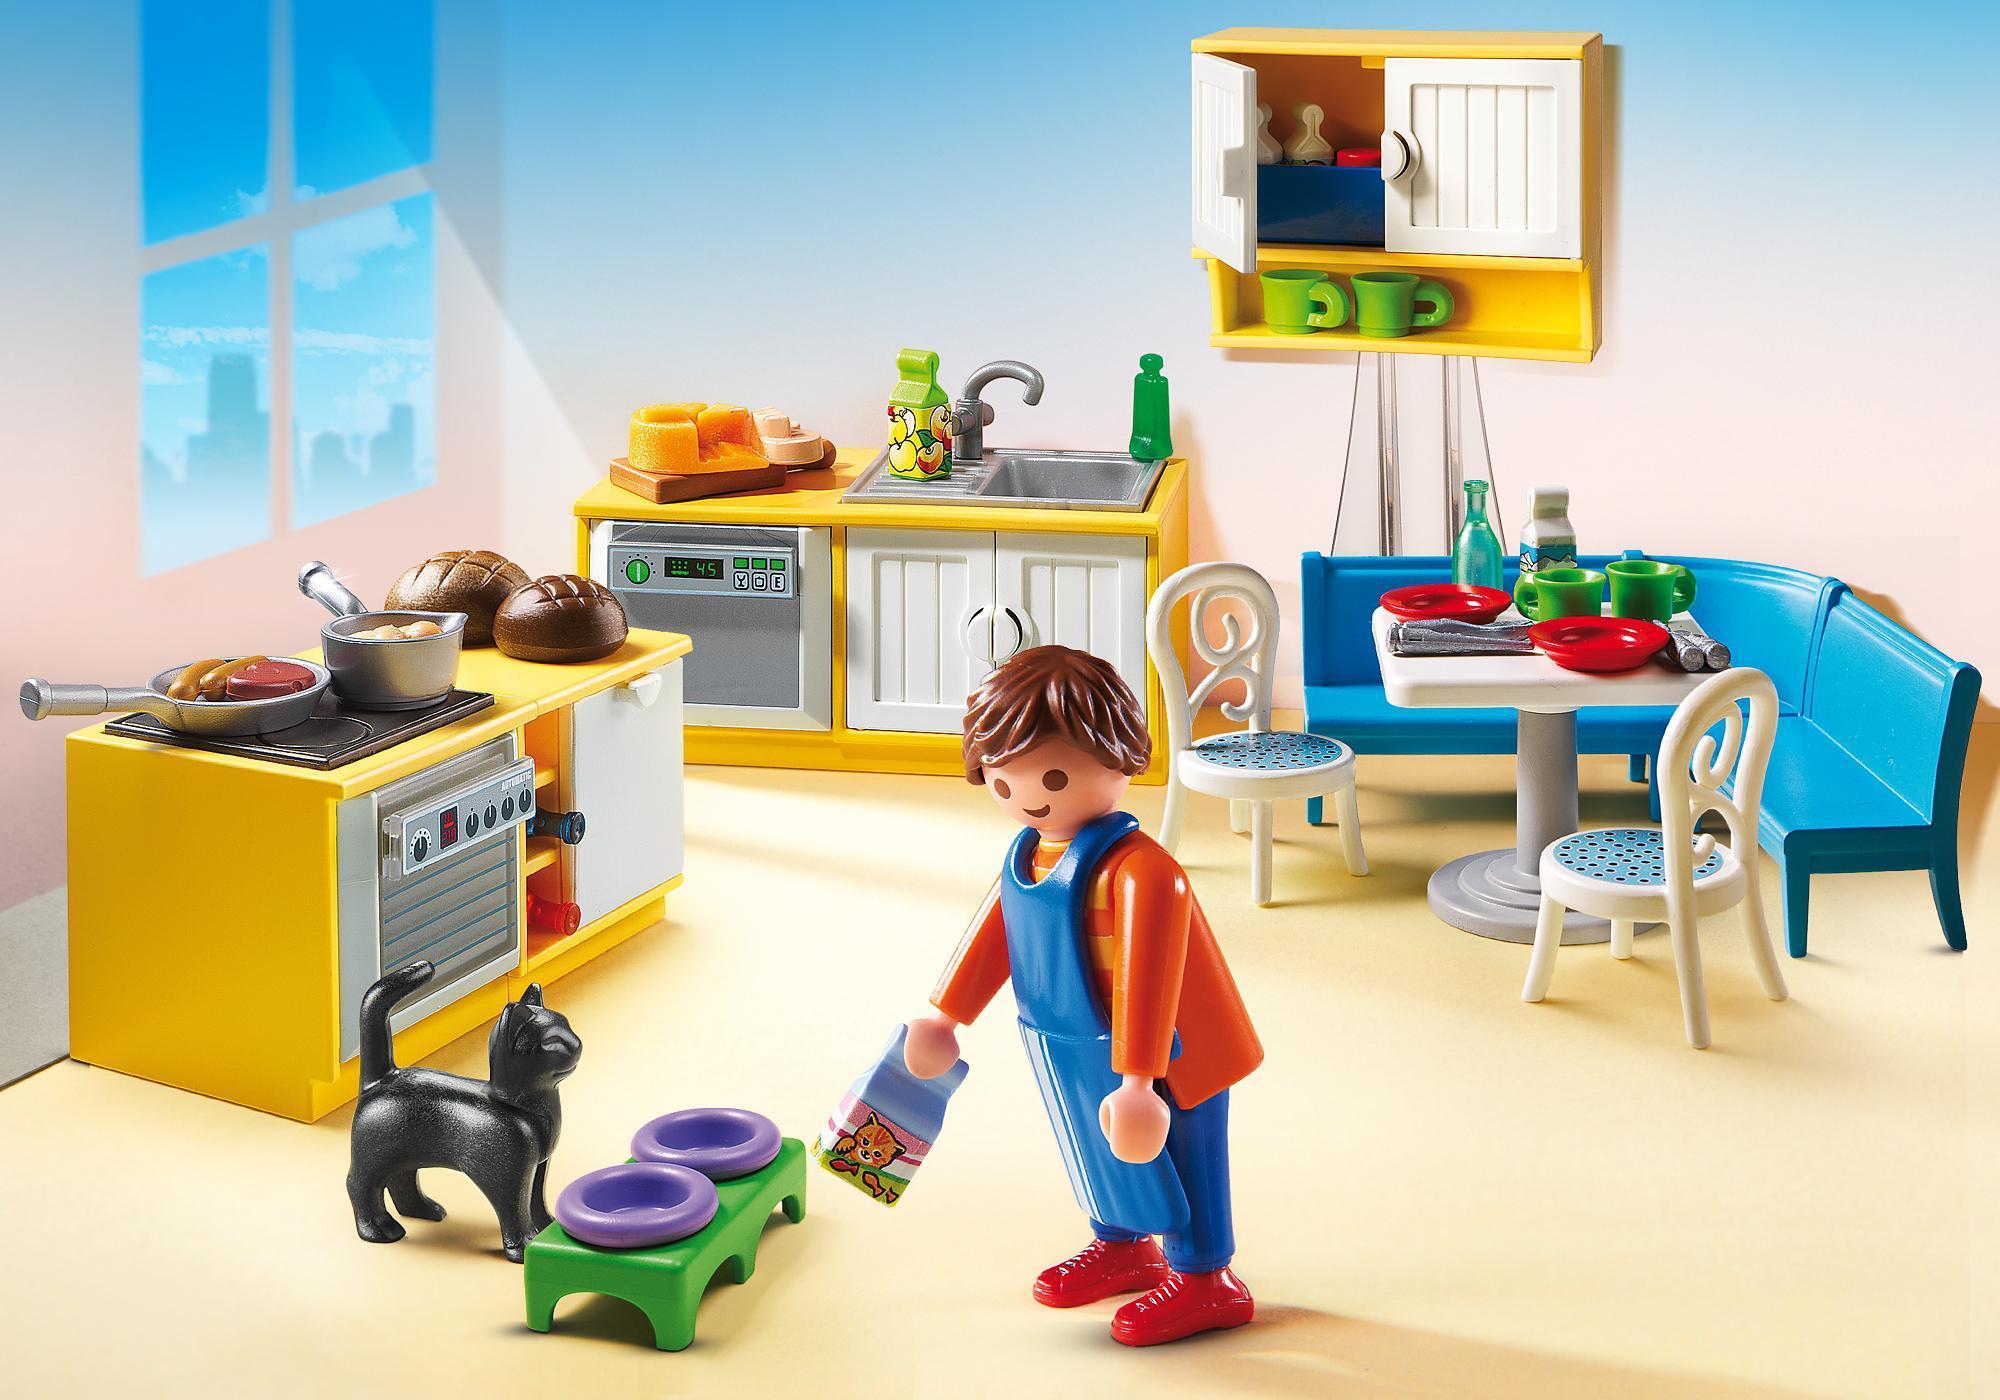 http://media.playmobil.com/i/playmobil/5336_product_detail/Cuisine avec coin repas